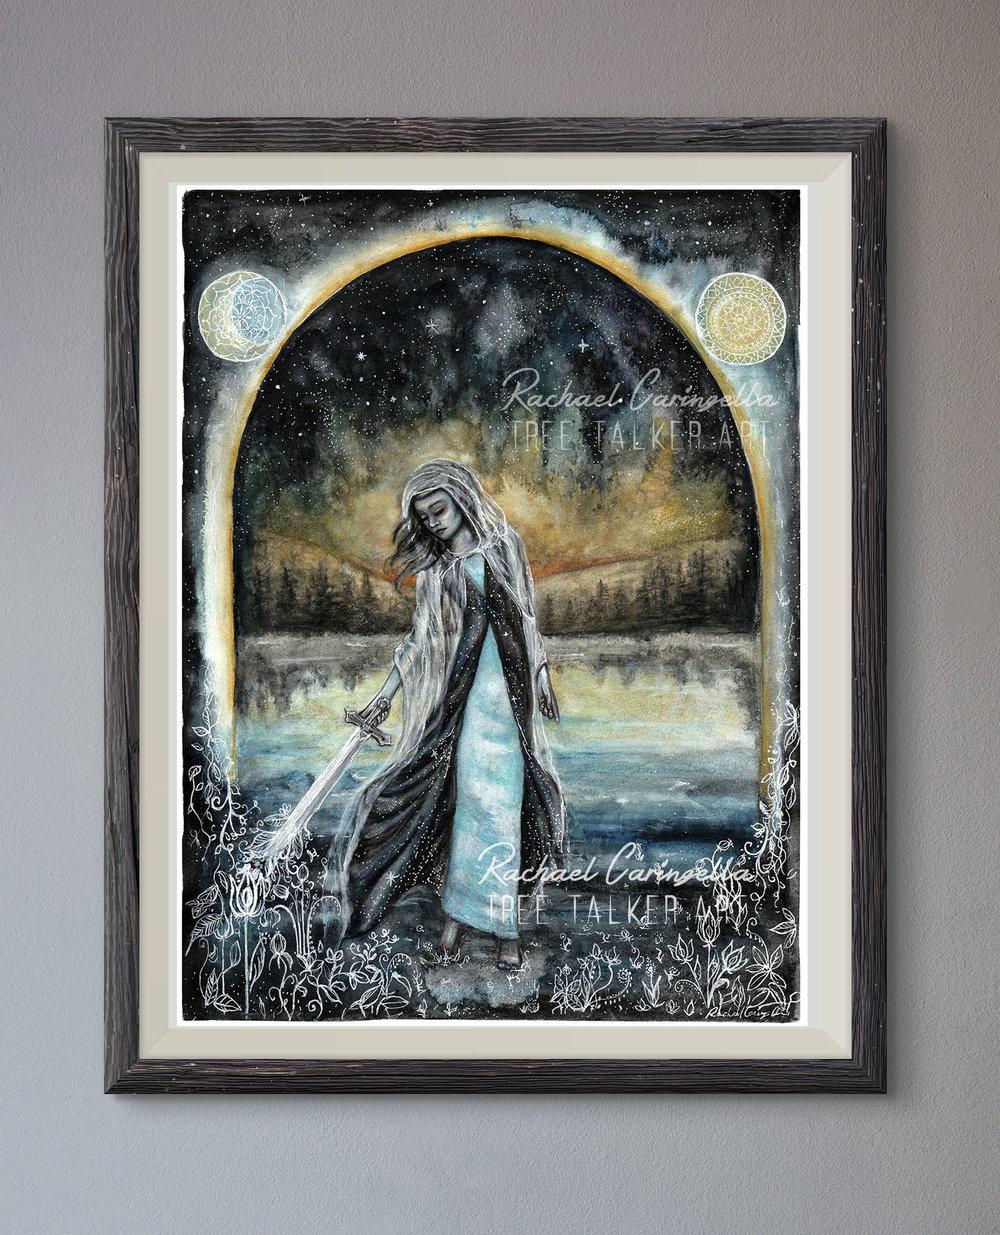 Warrior Mixed Media Painting by Rachael Caringella | Tree Talker Art